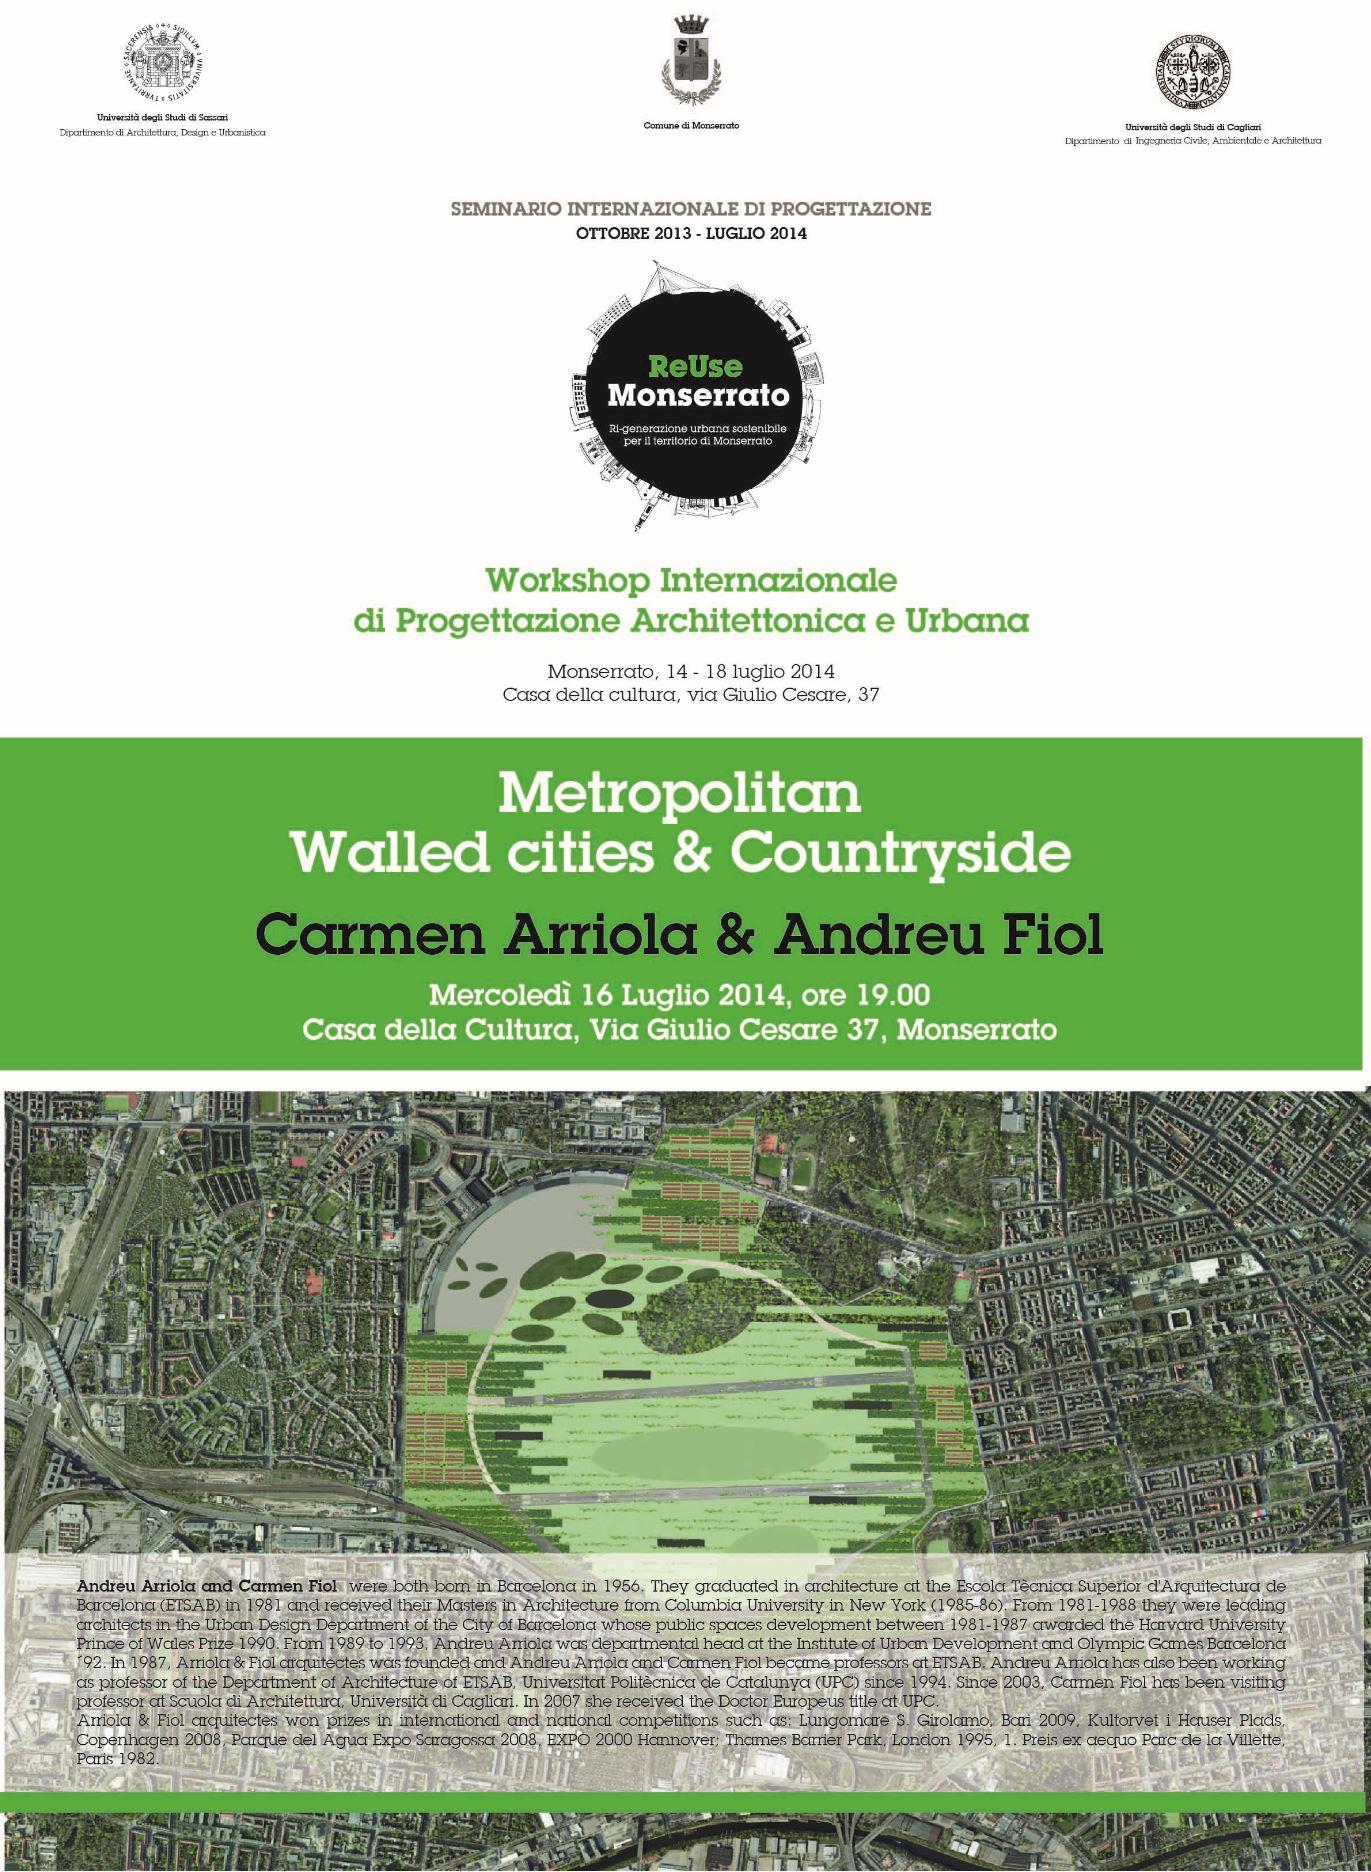 Metropolitan Walled cities & Countryside